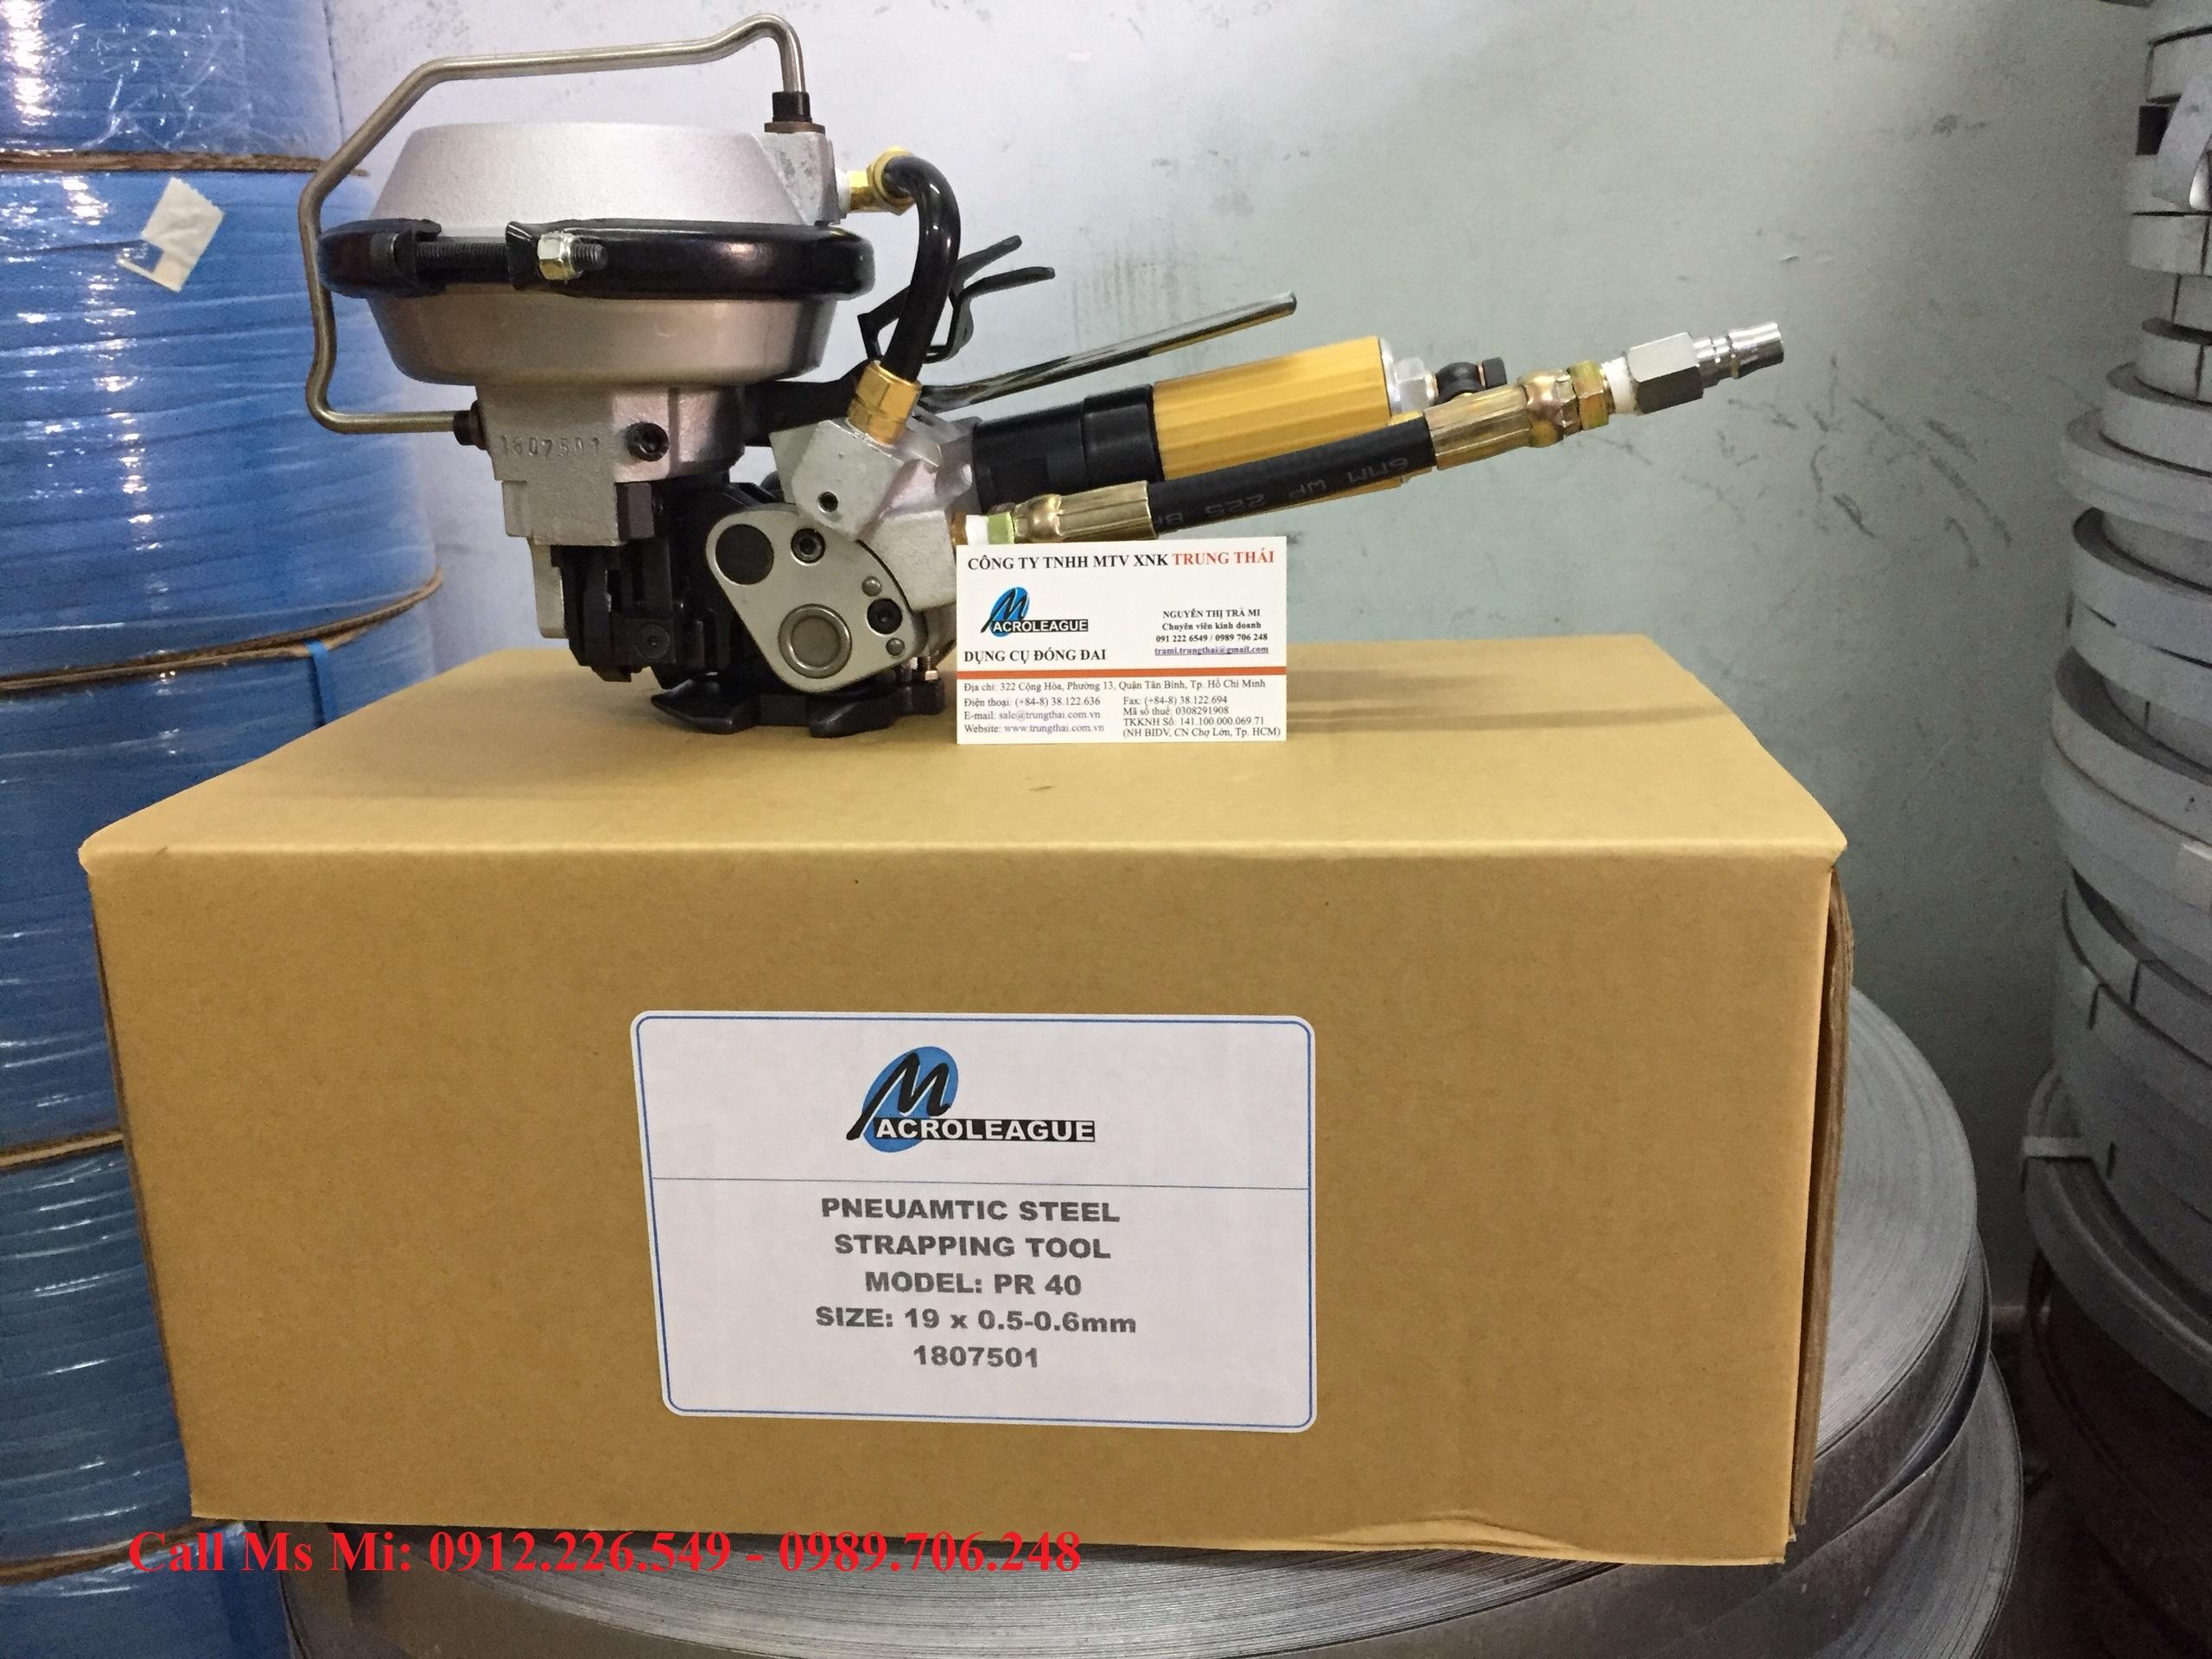 Máy siết đai thép 19mm (3 in 1) dùng khí nén MACROLEAGUE PR40